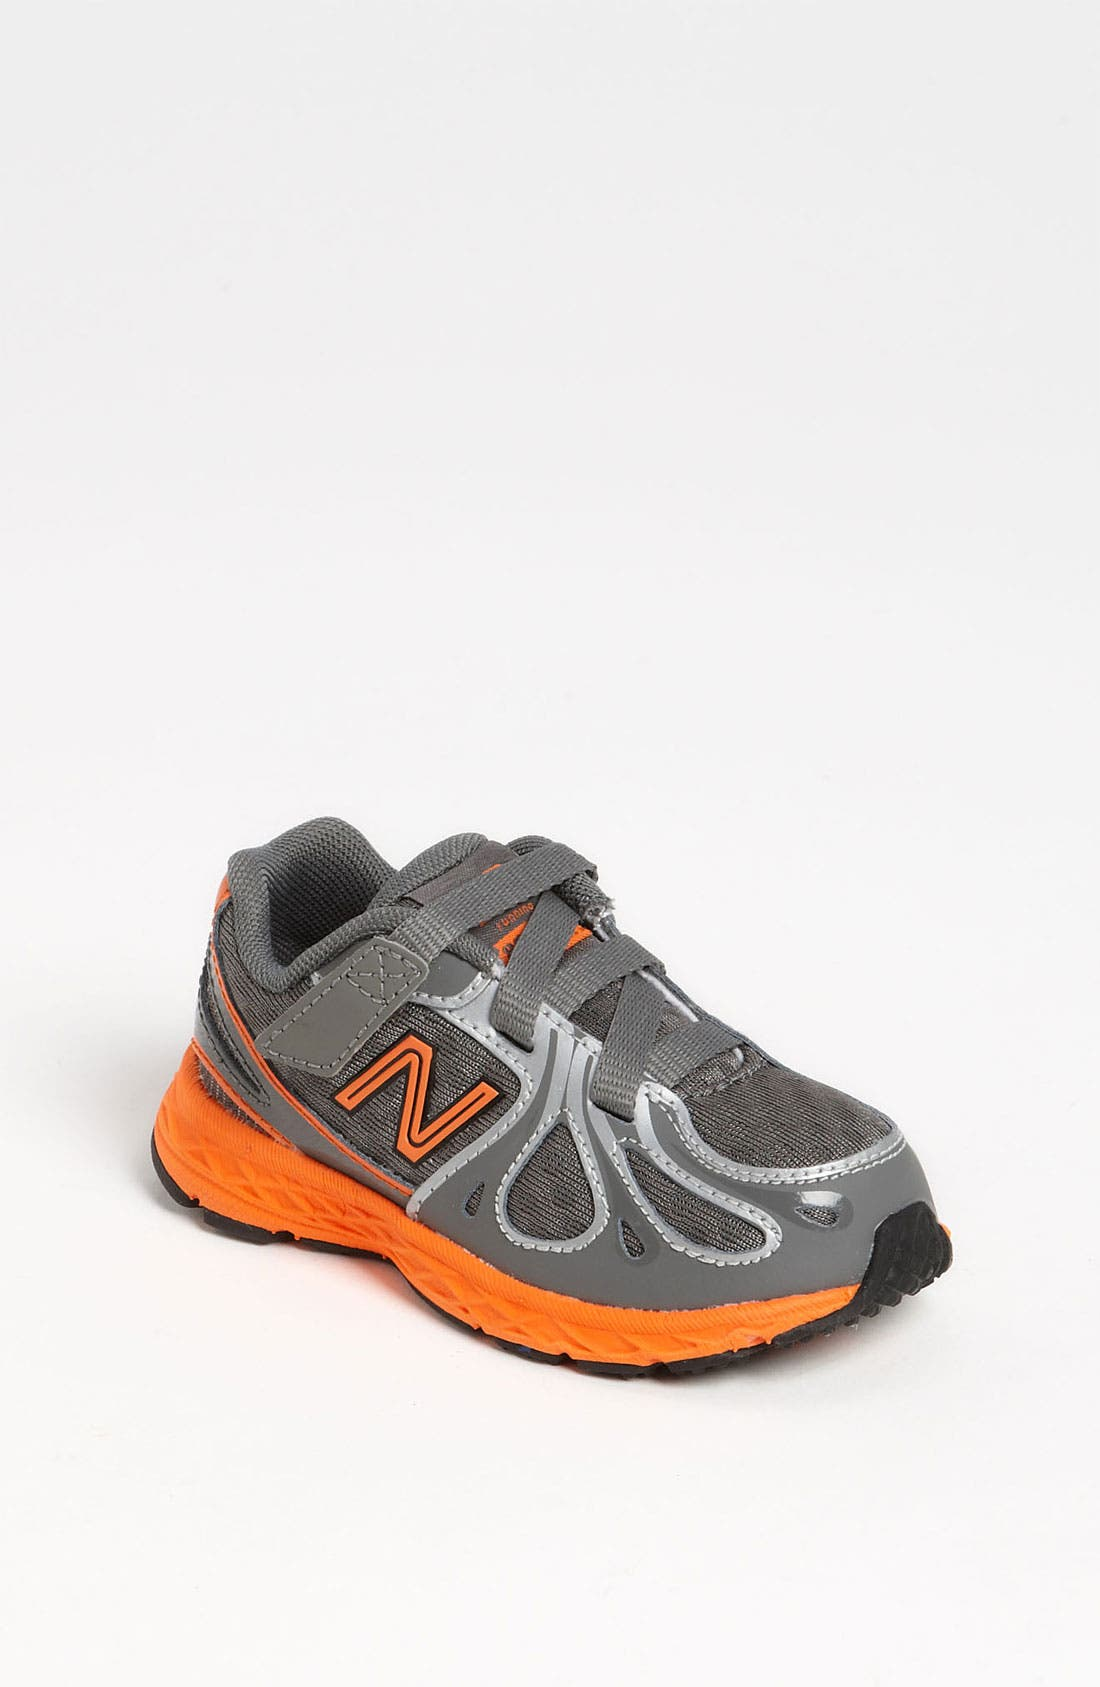 Alternate Image 1 Selected - New Balance '890' Sneaker (Baby, Walker & Toddler) (Online Only)